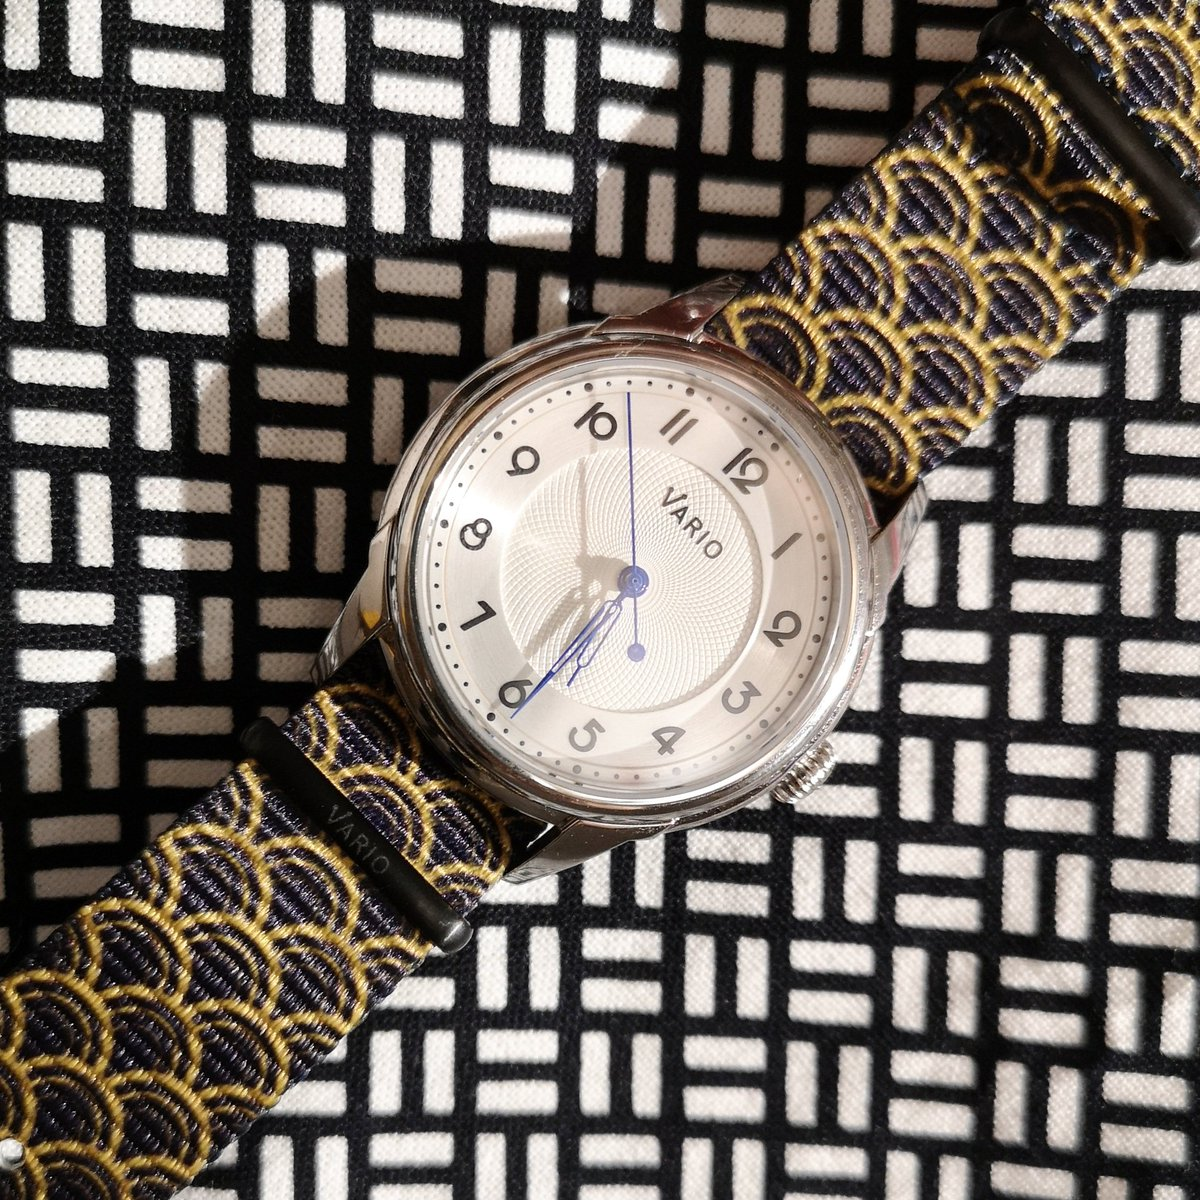 I'll also be reviewing some cool straps @varioeveryday offers.⌚  VARIOのストラップも近々レビュー予定です。   #watchesofinstagram #watchoftheday #varioeveryday #NATOstrap #strap #seigaiha  #時計好き #手元倶楽部 #ストラップ #青海波 #ファッション